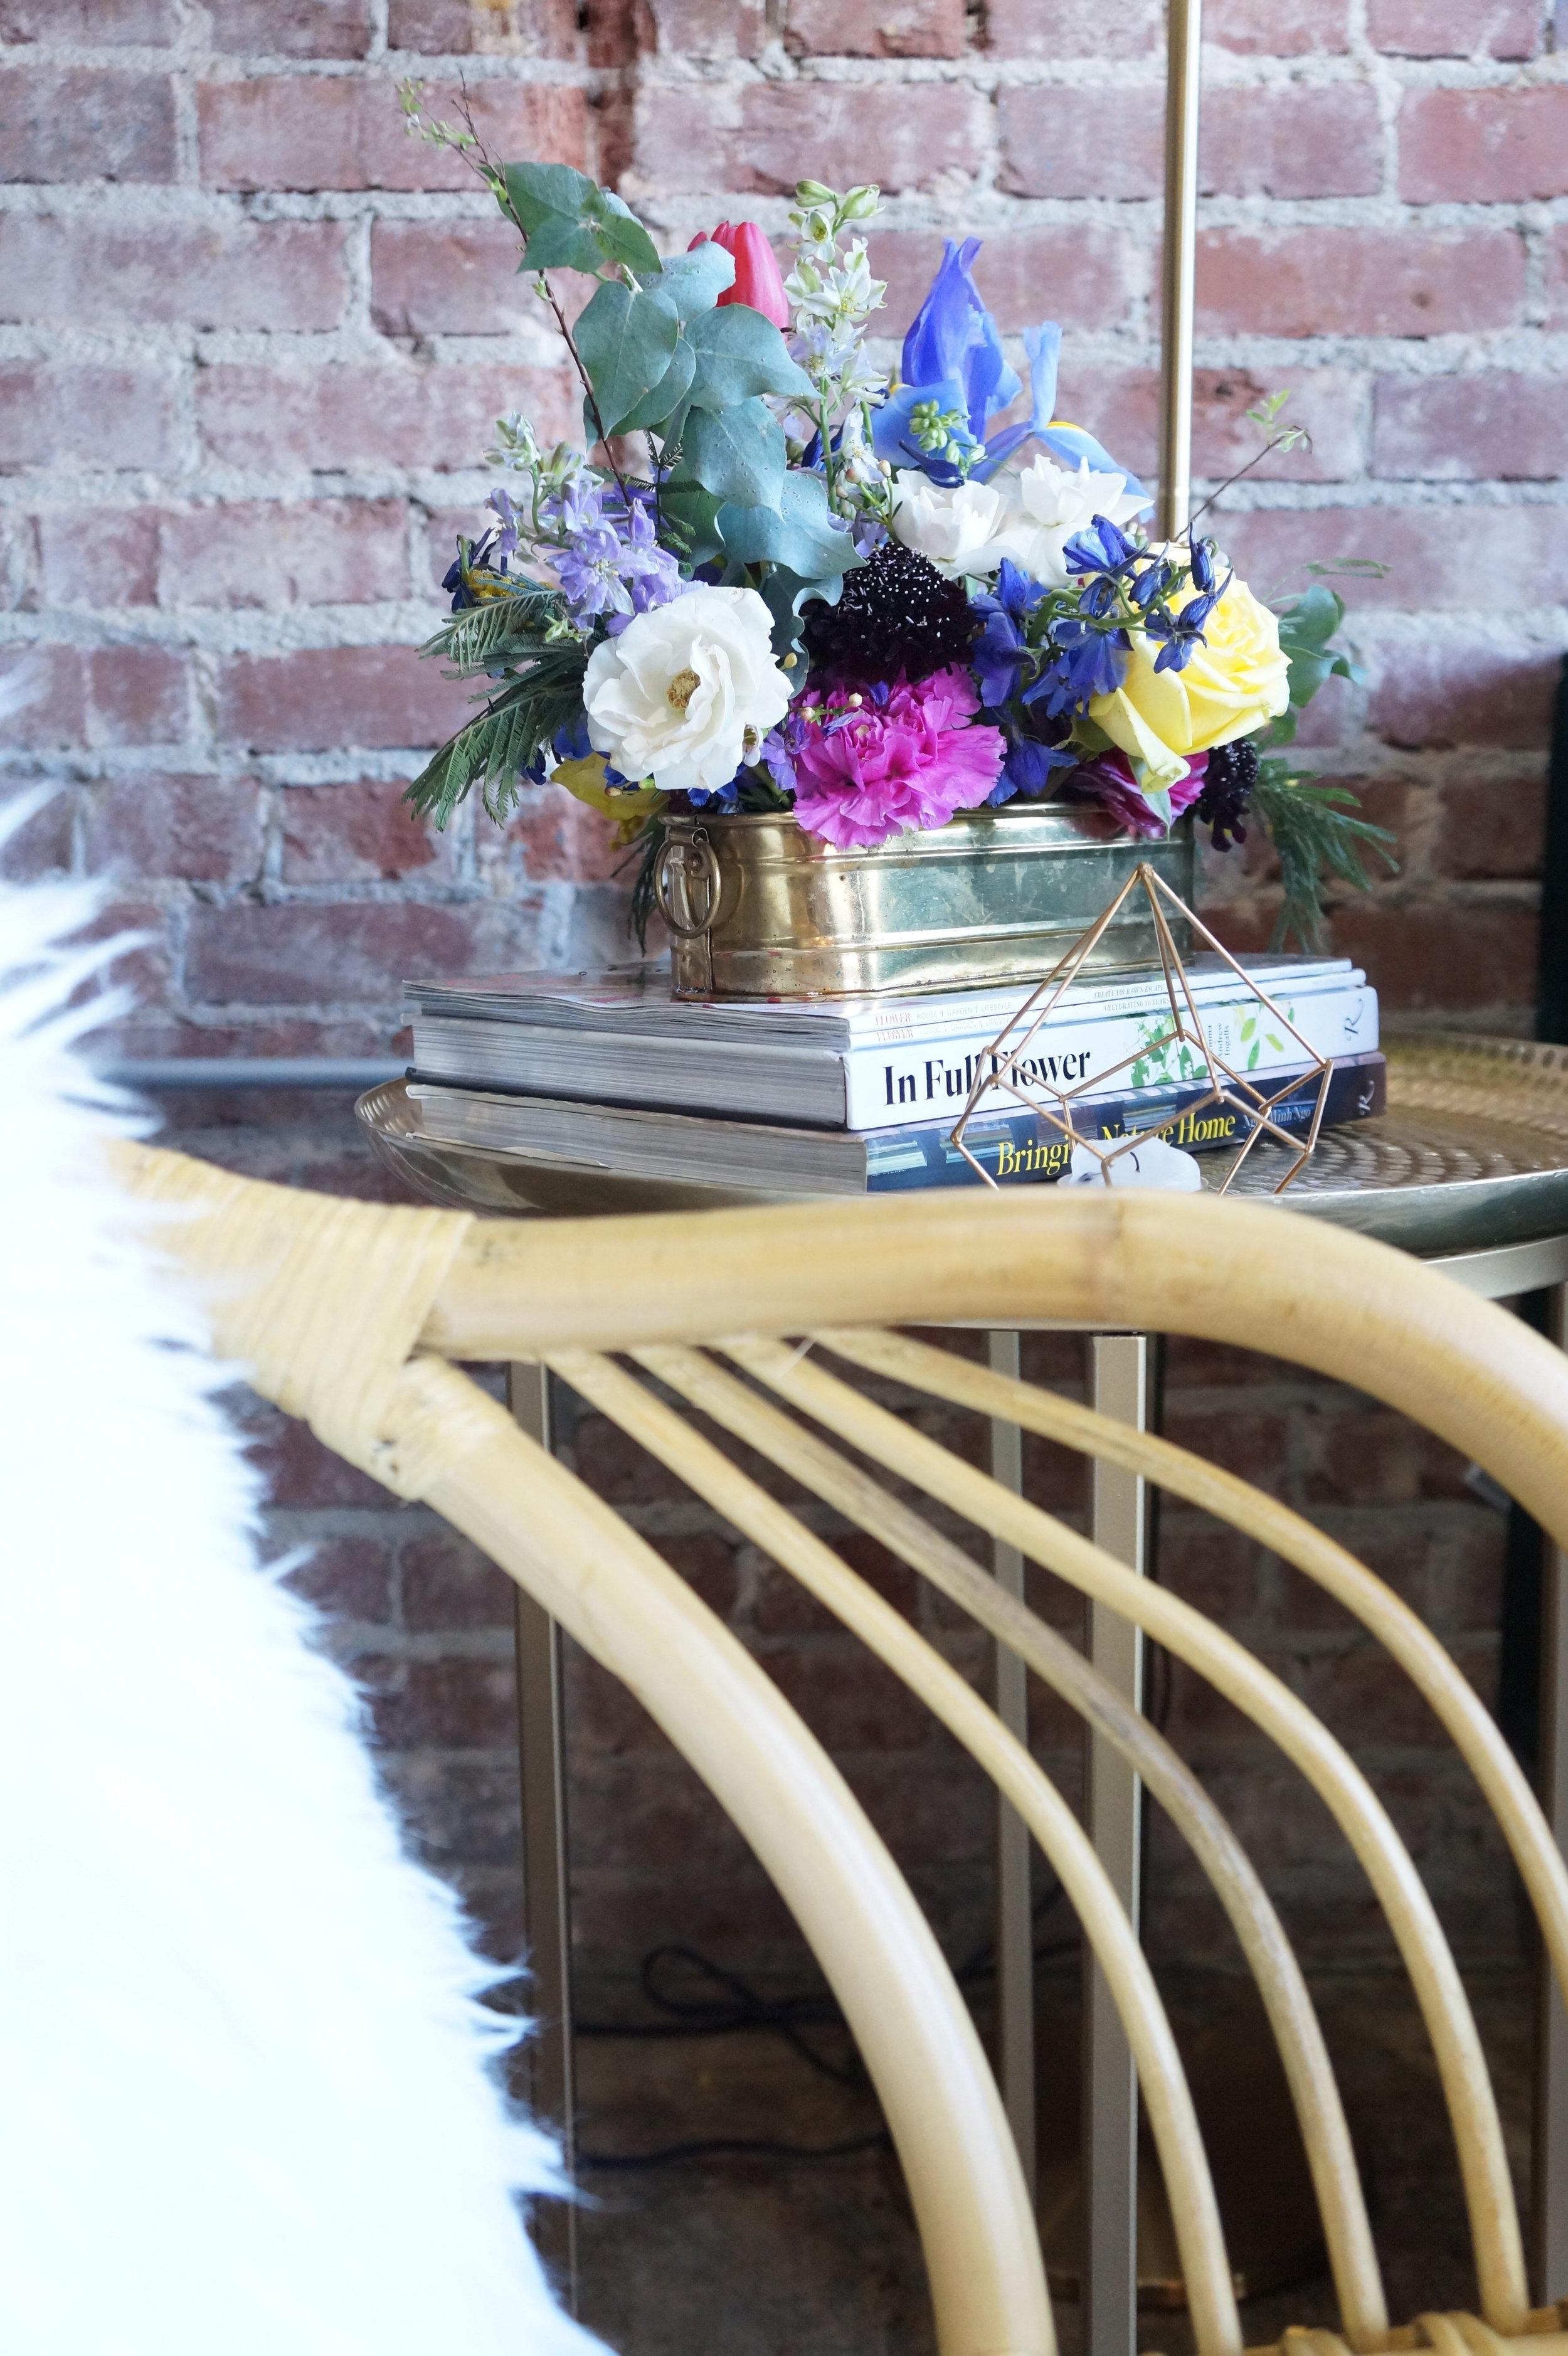 Andrea Fenise Memphis Fashion Blogger shares Everbloom Deisn